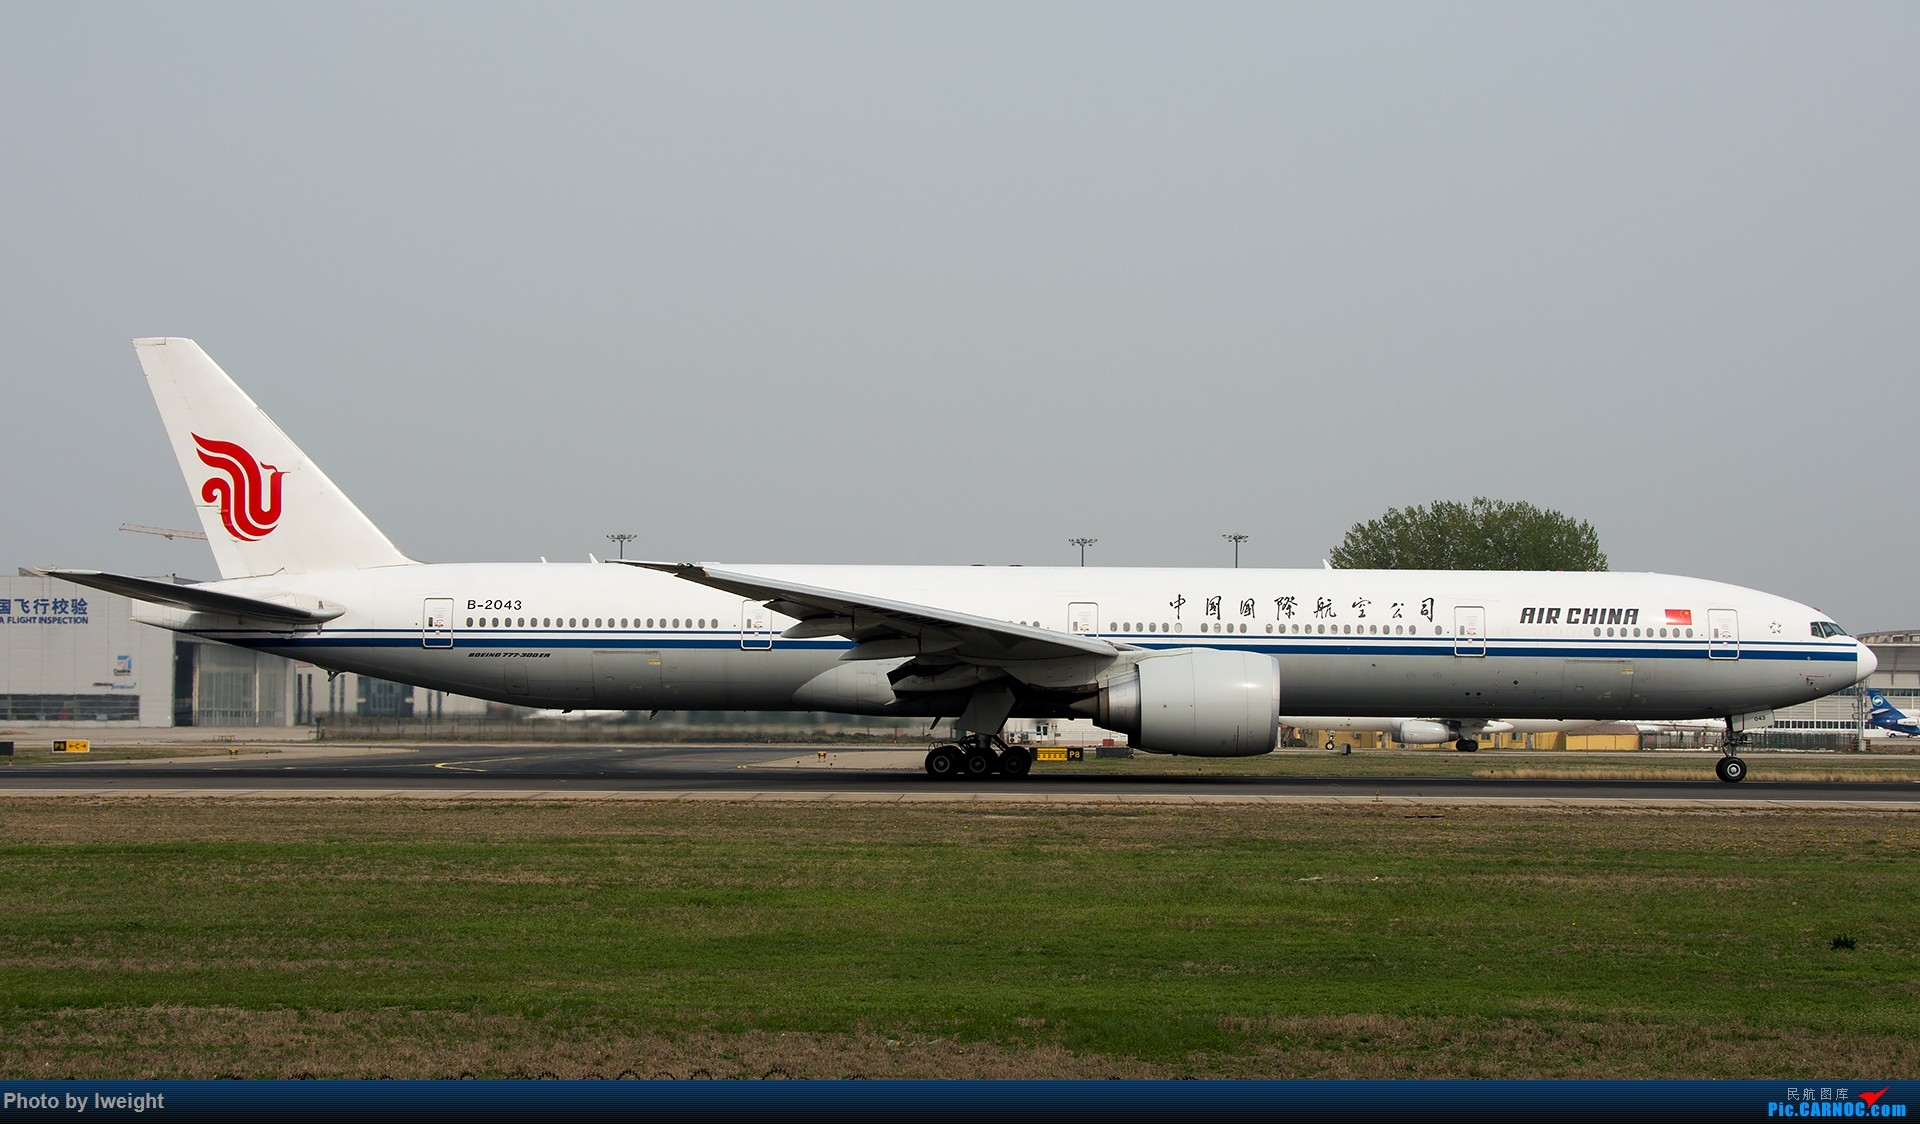 Re:[原创]霾,18R,高密度 BOEING 777-300ER B-2043 中国北京首都国际机场